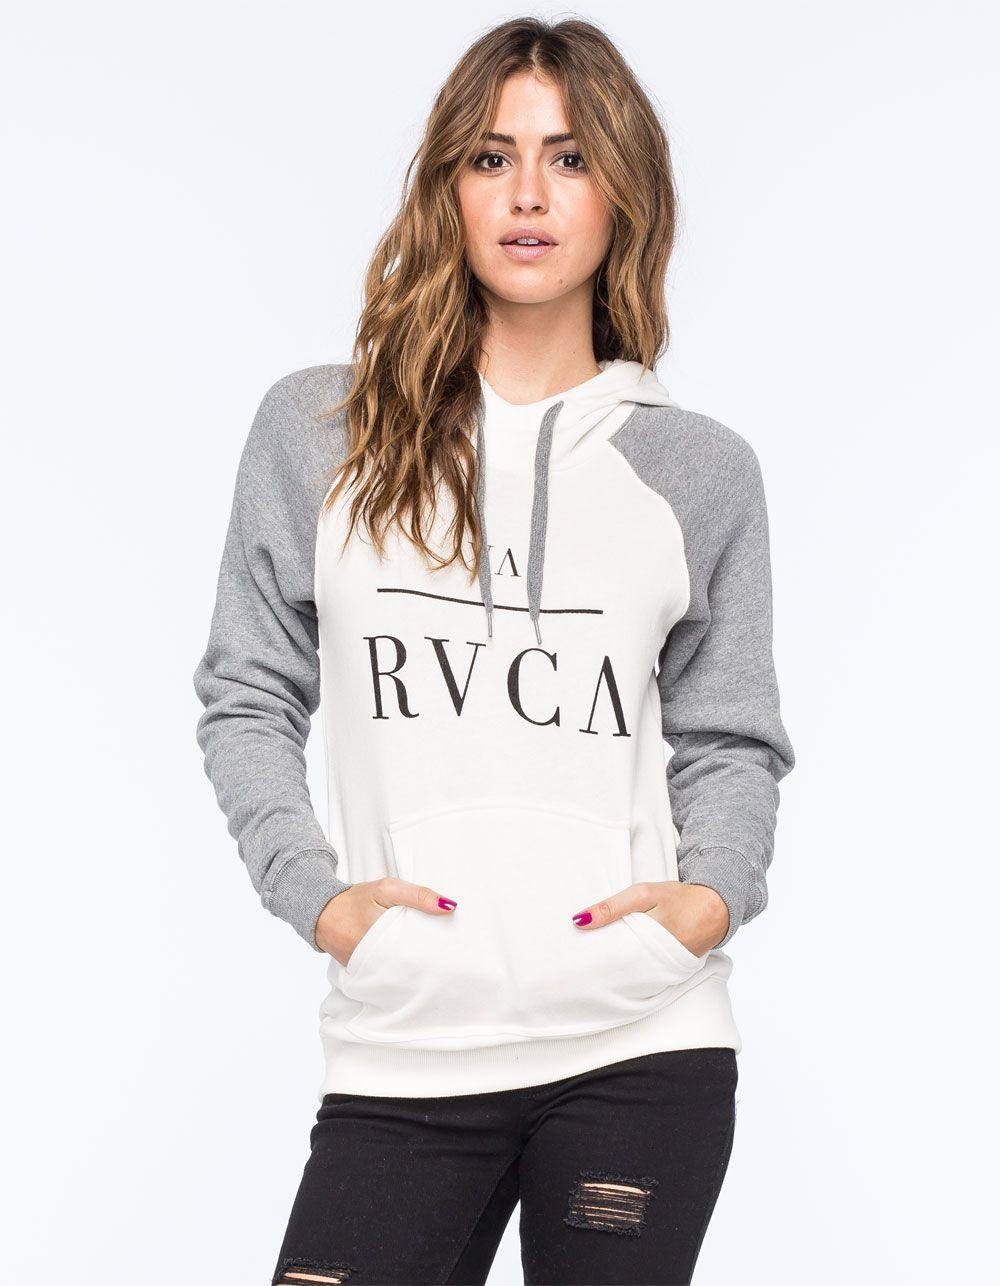 60bd60d4 RVCA Substance Womens Raglan Hoodie 258199167 | Sweatshirts & Hoodies  Autumn Winter Fashion, Winter Style